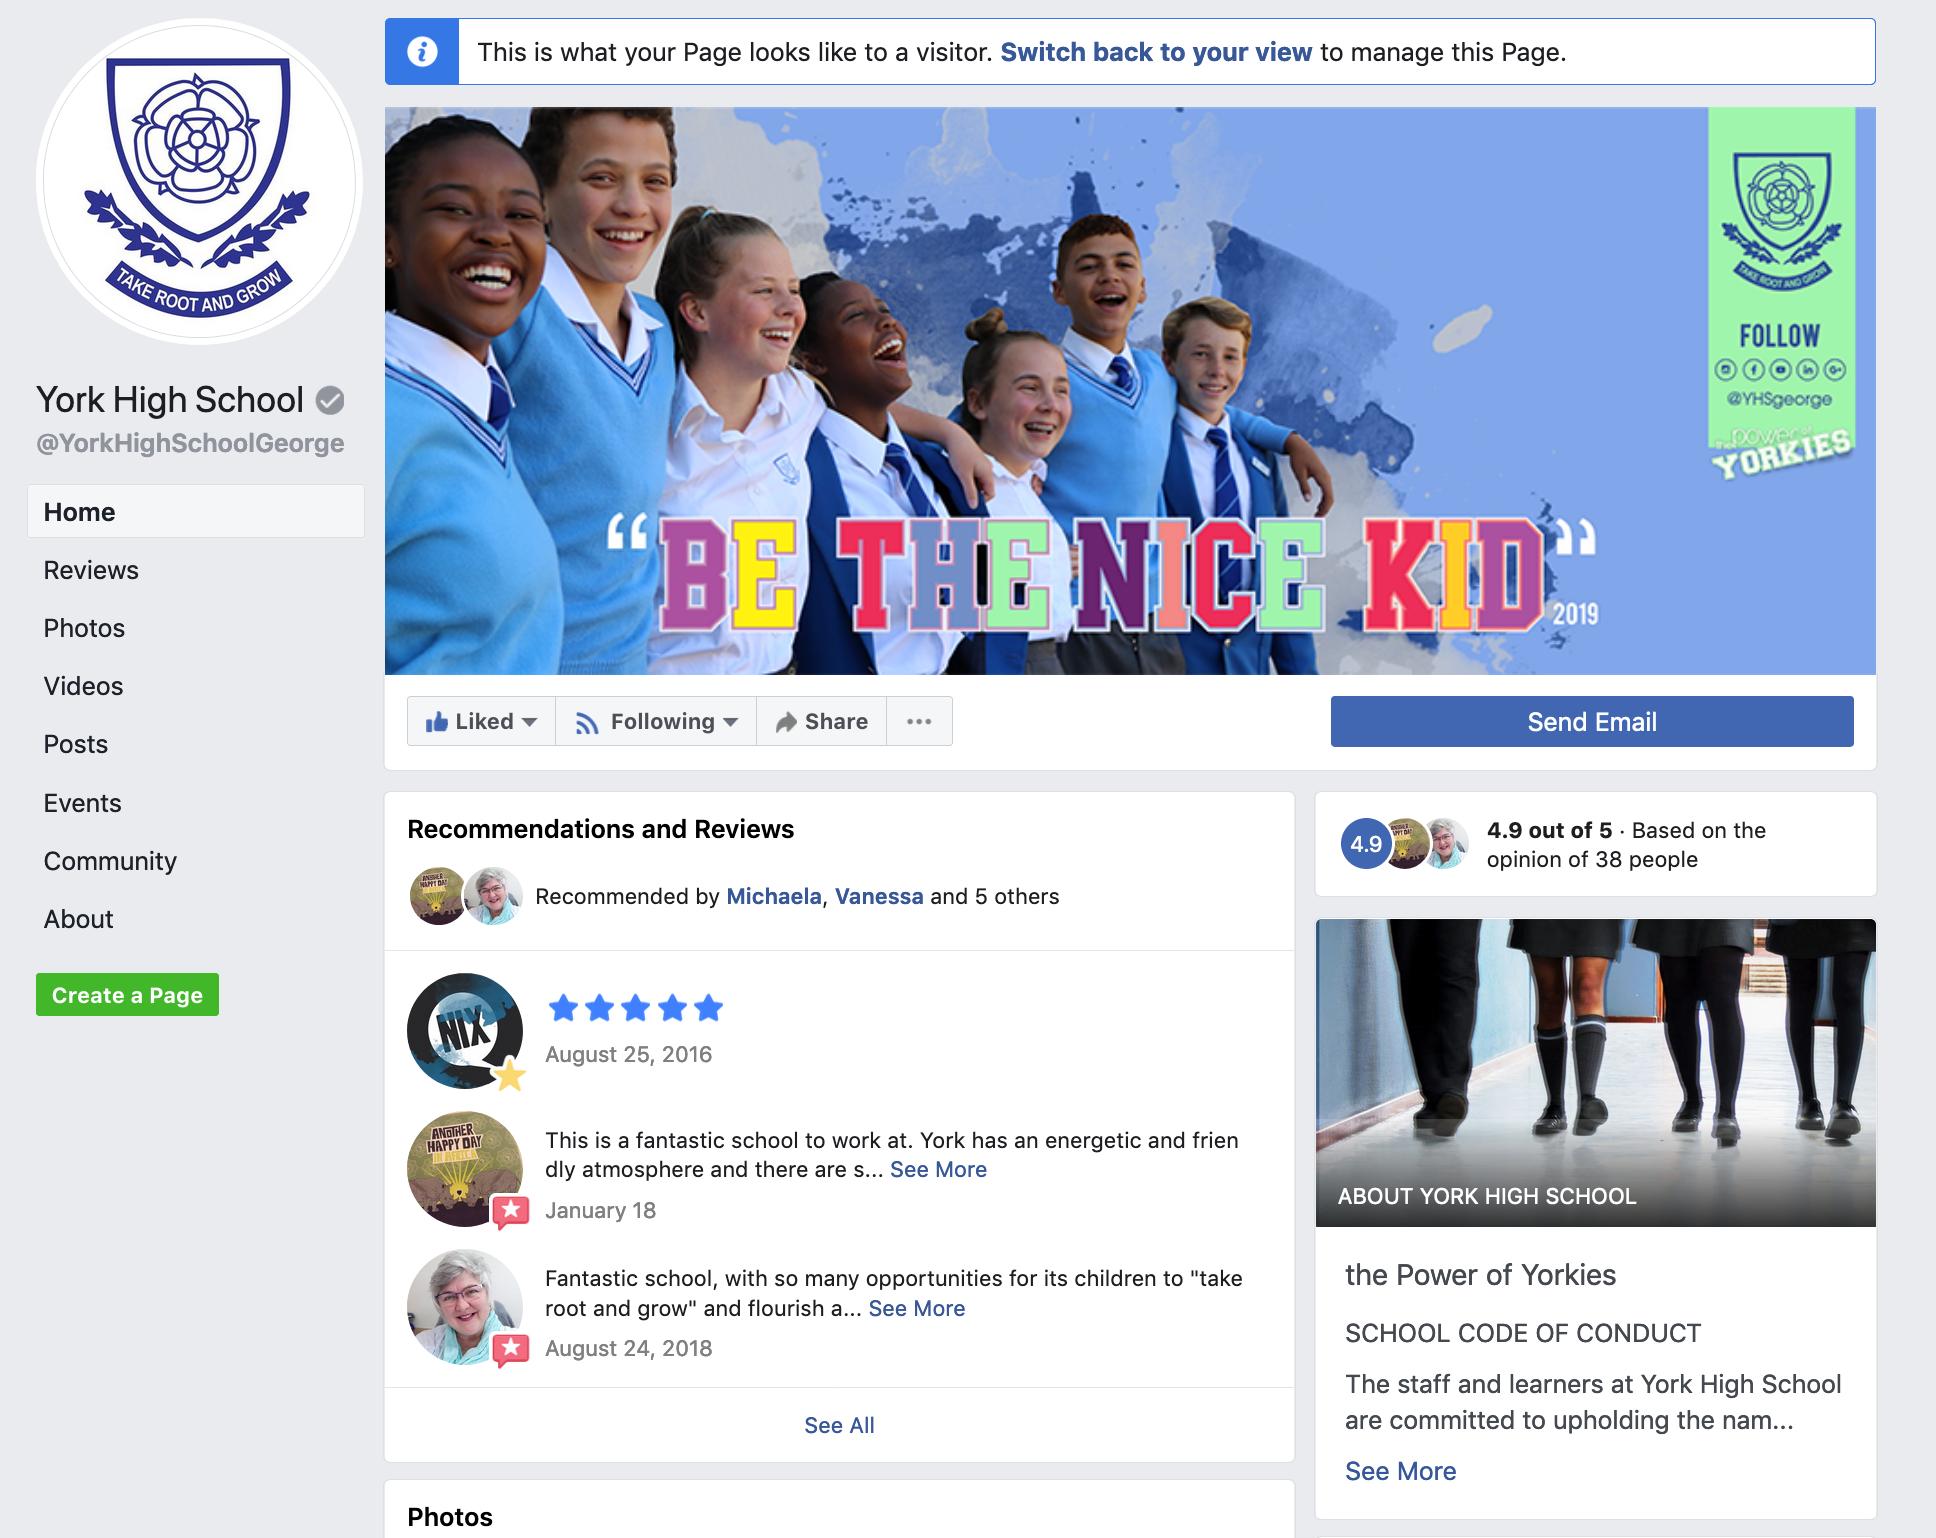 York High School Facebook